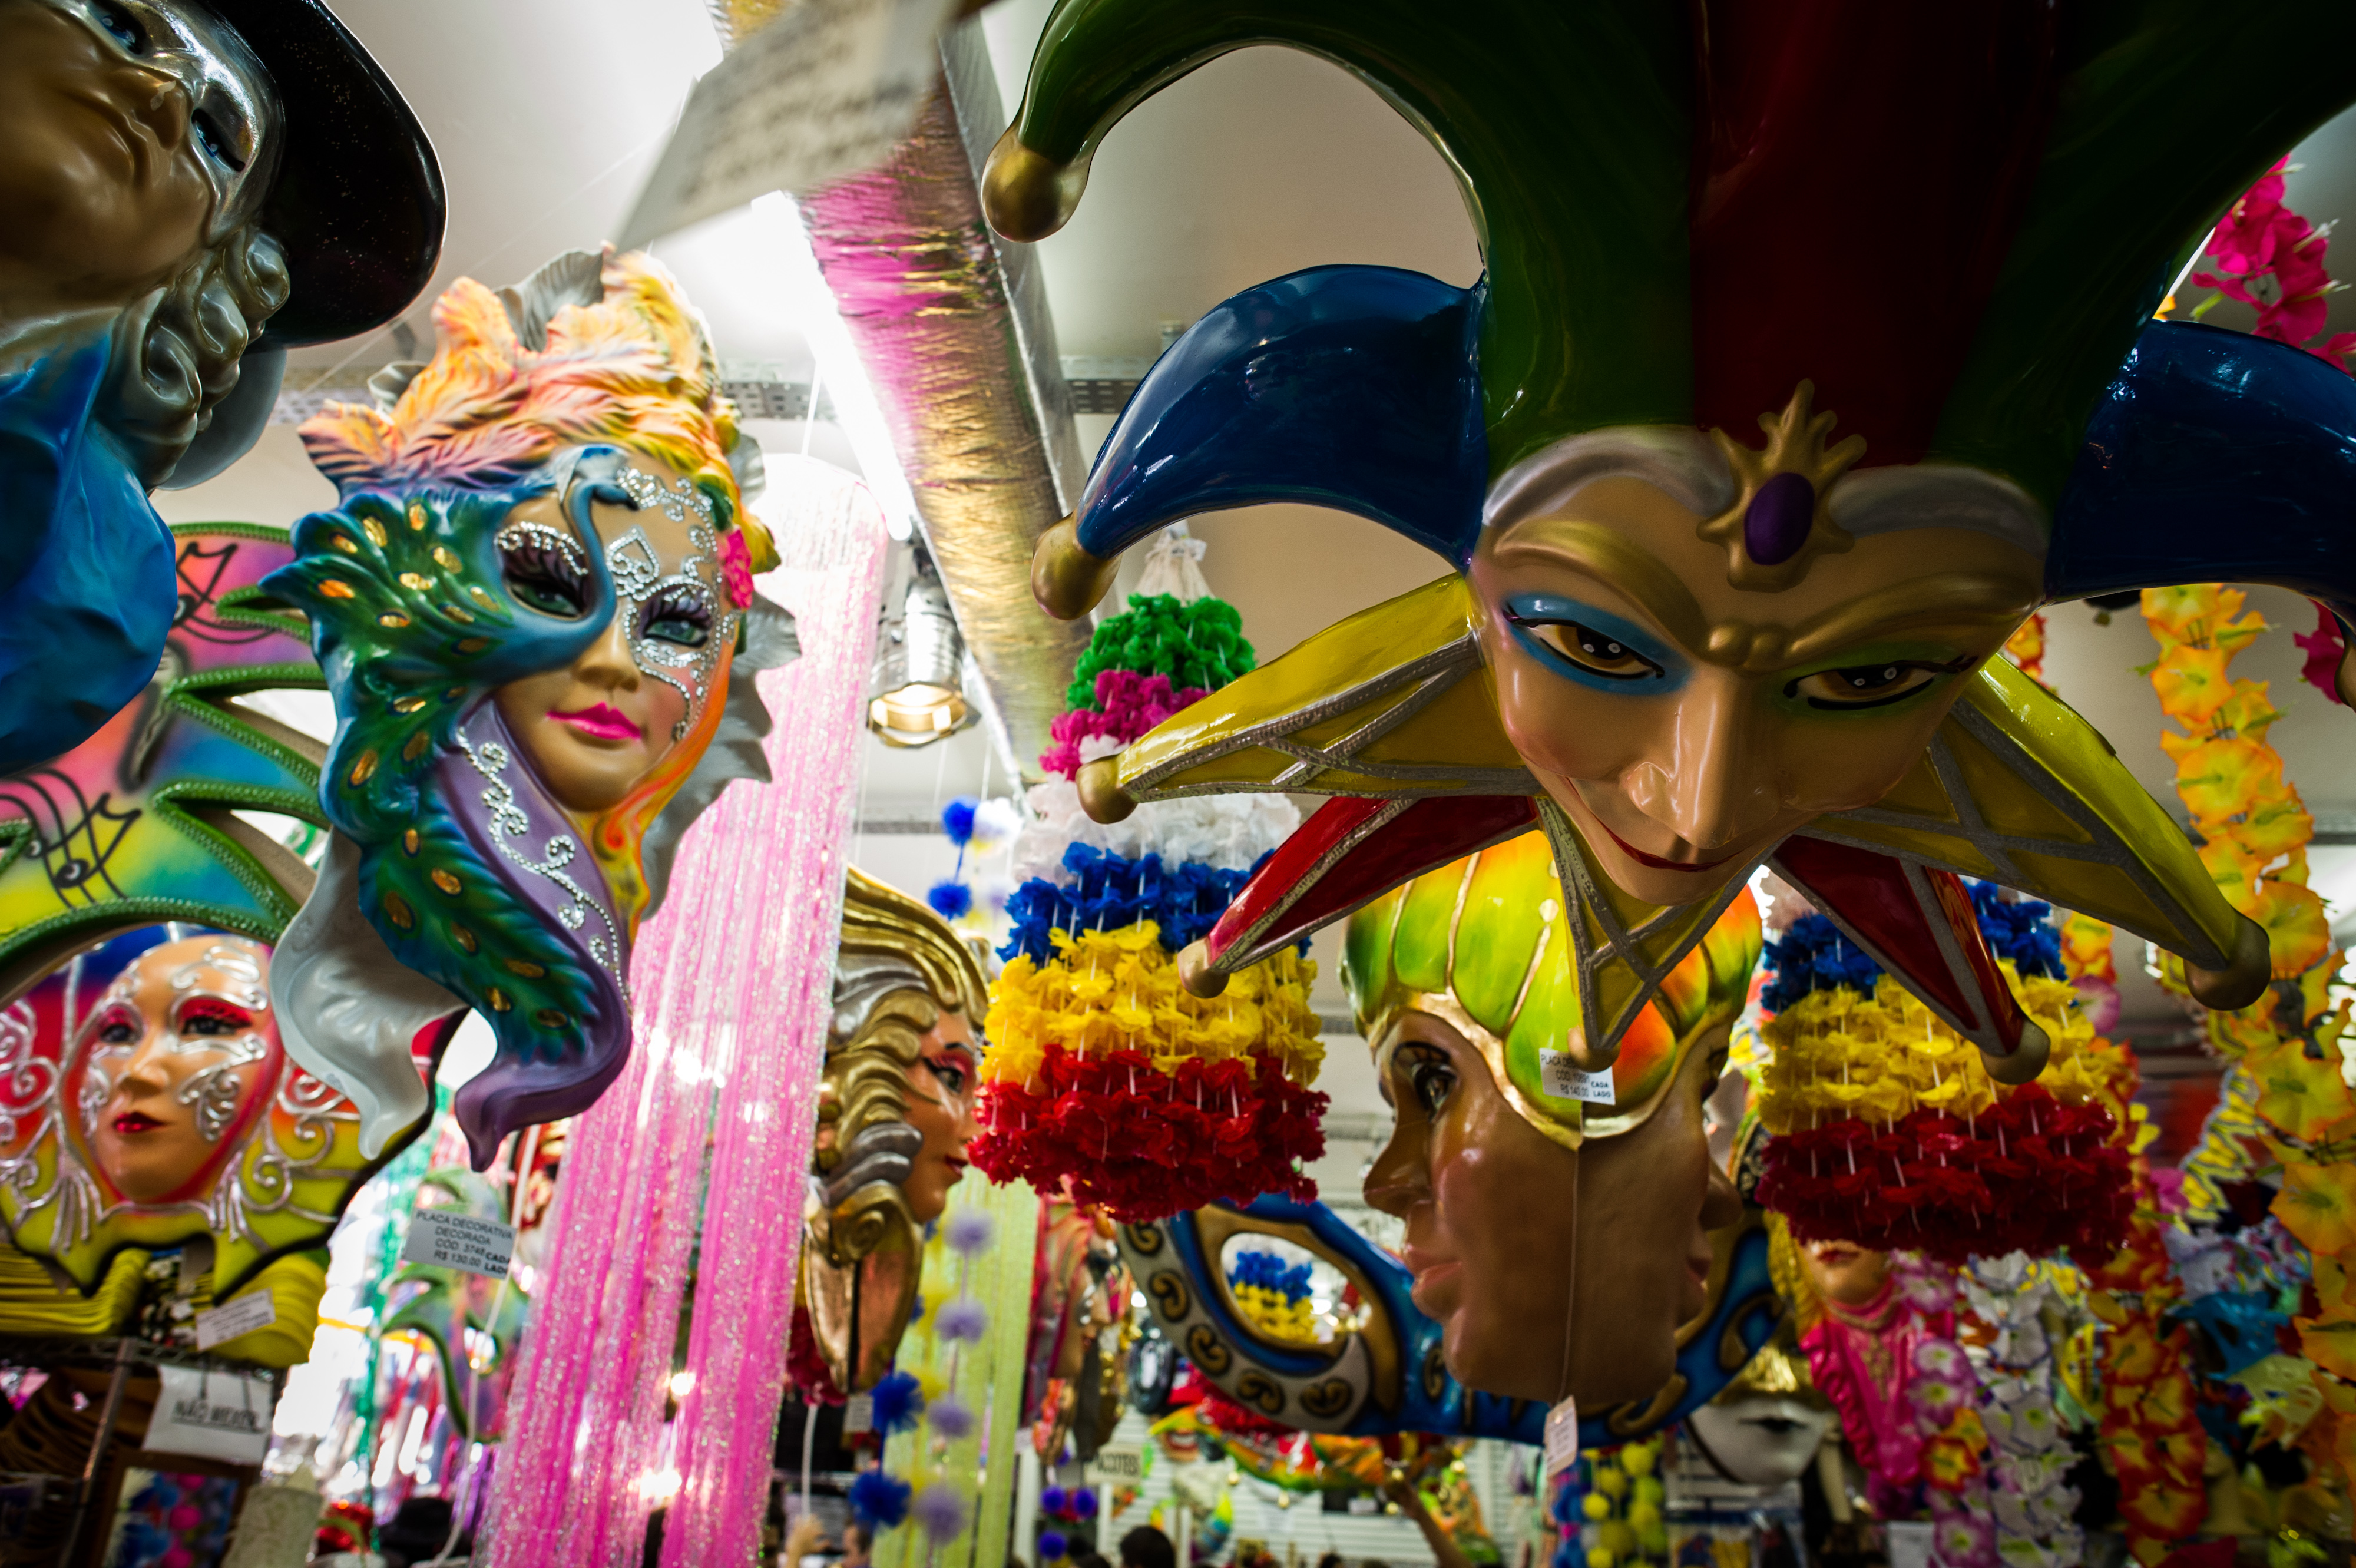 Carnevale idee per addobbi fai da te e decorazioni for Addobbi casa fai da te